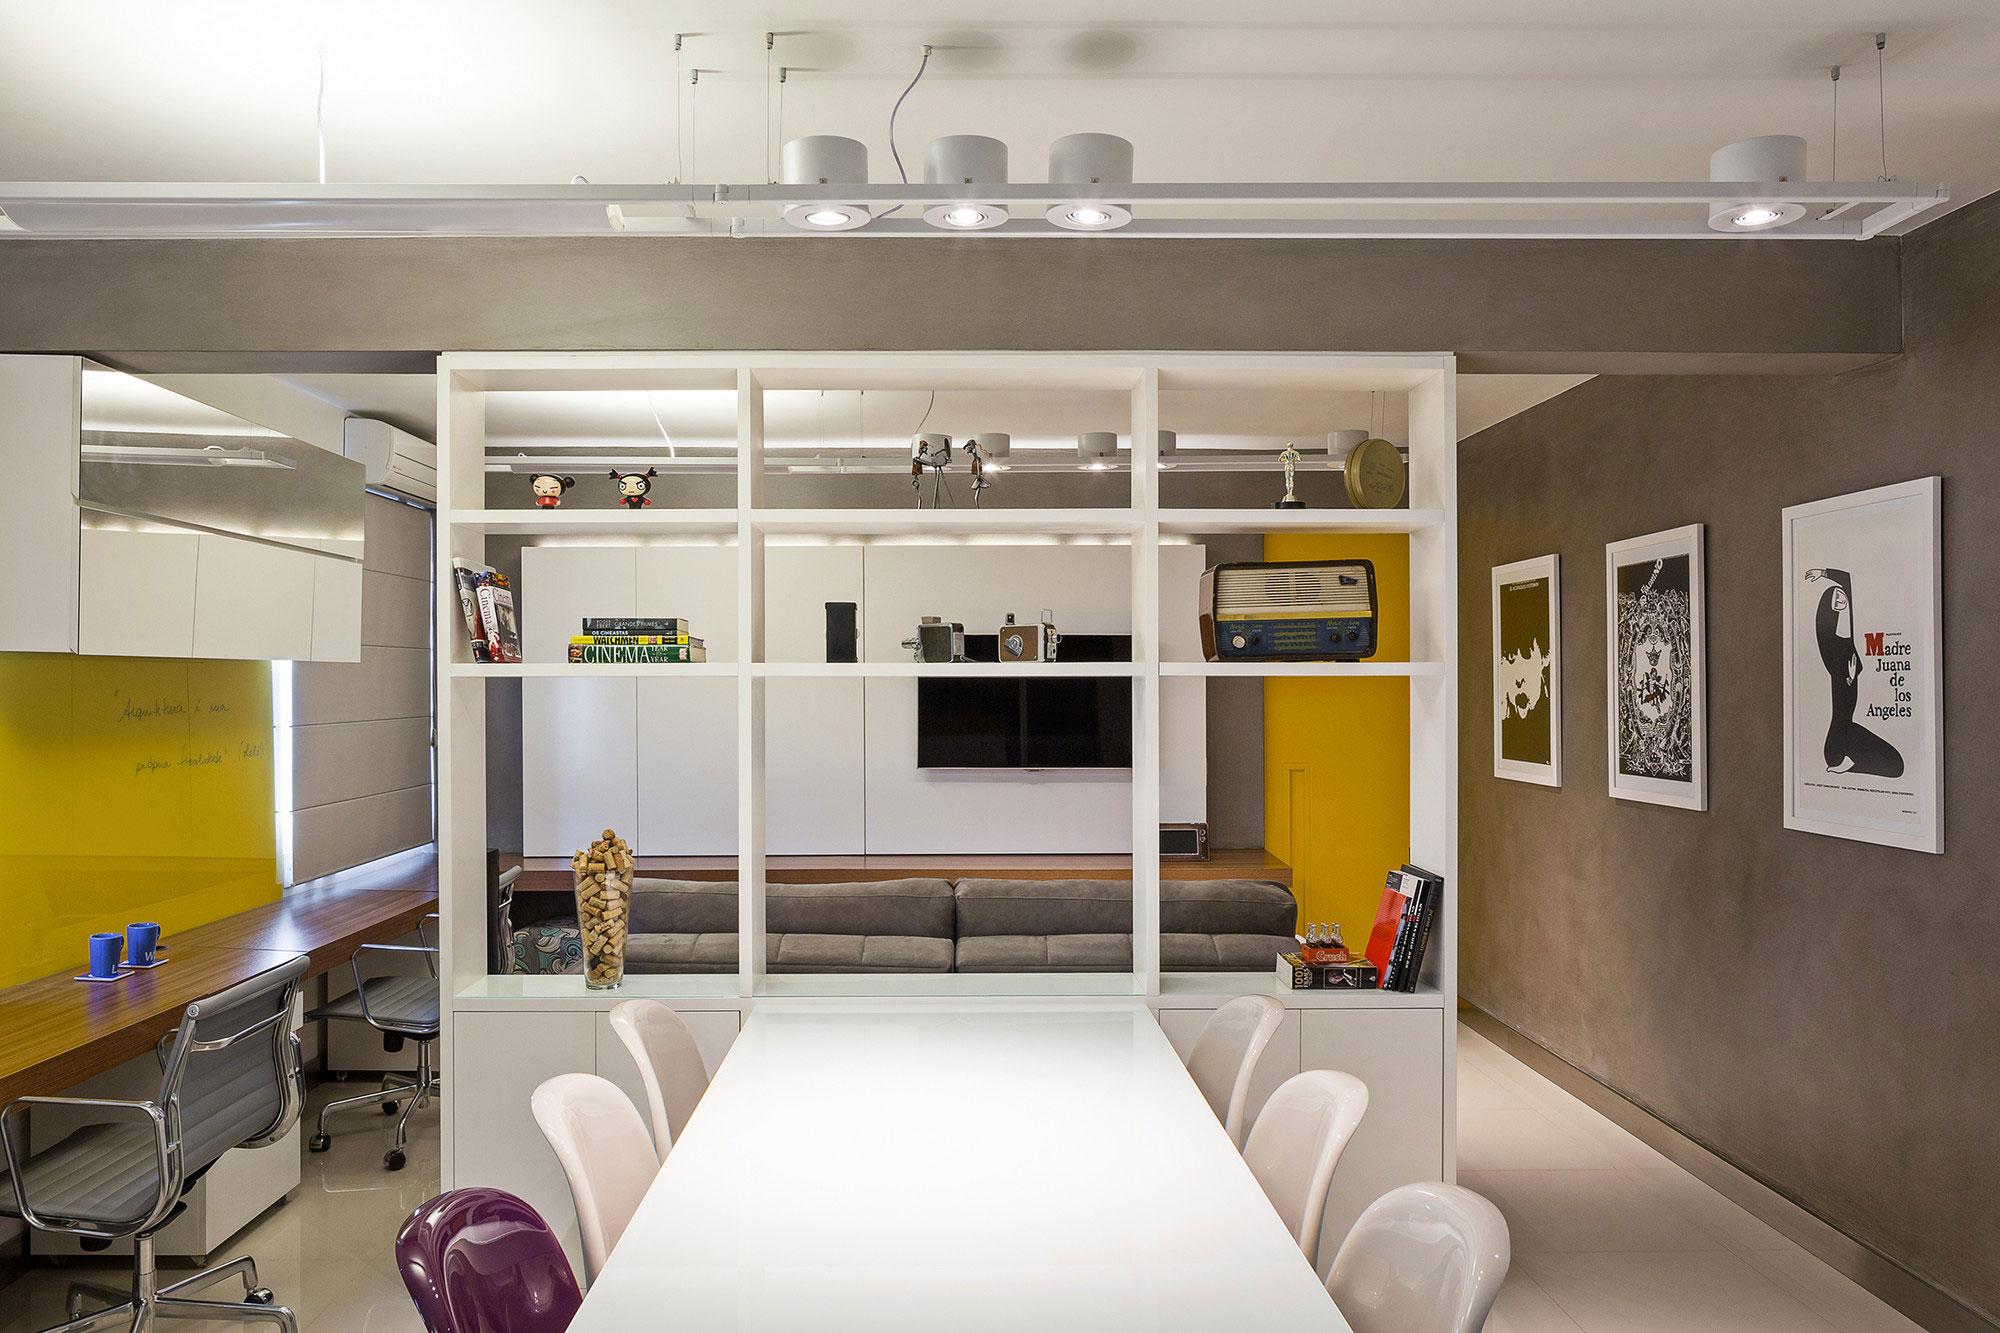 Sala Para Dois Ambientes 60 Projetos Integrados Fotos  -> Fotos De Ambientes